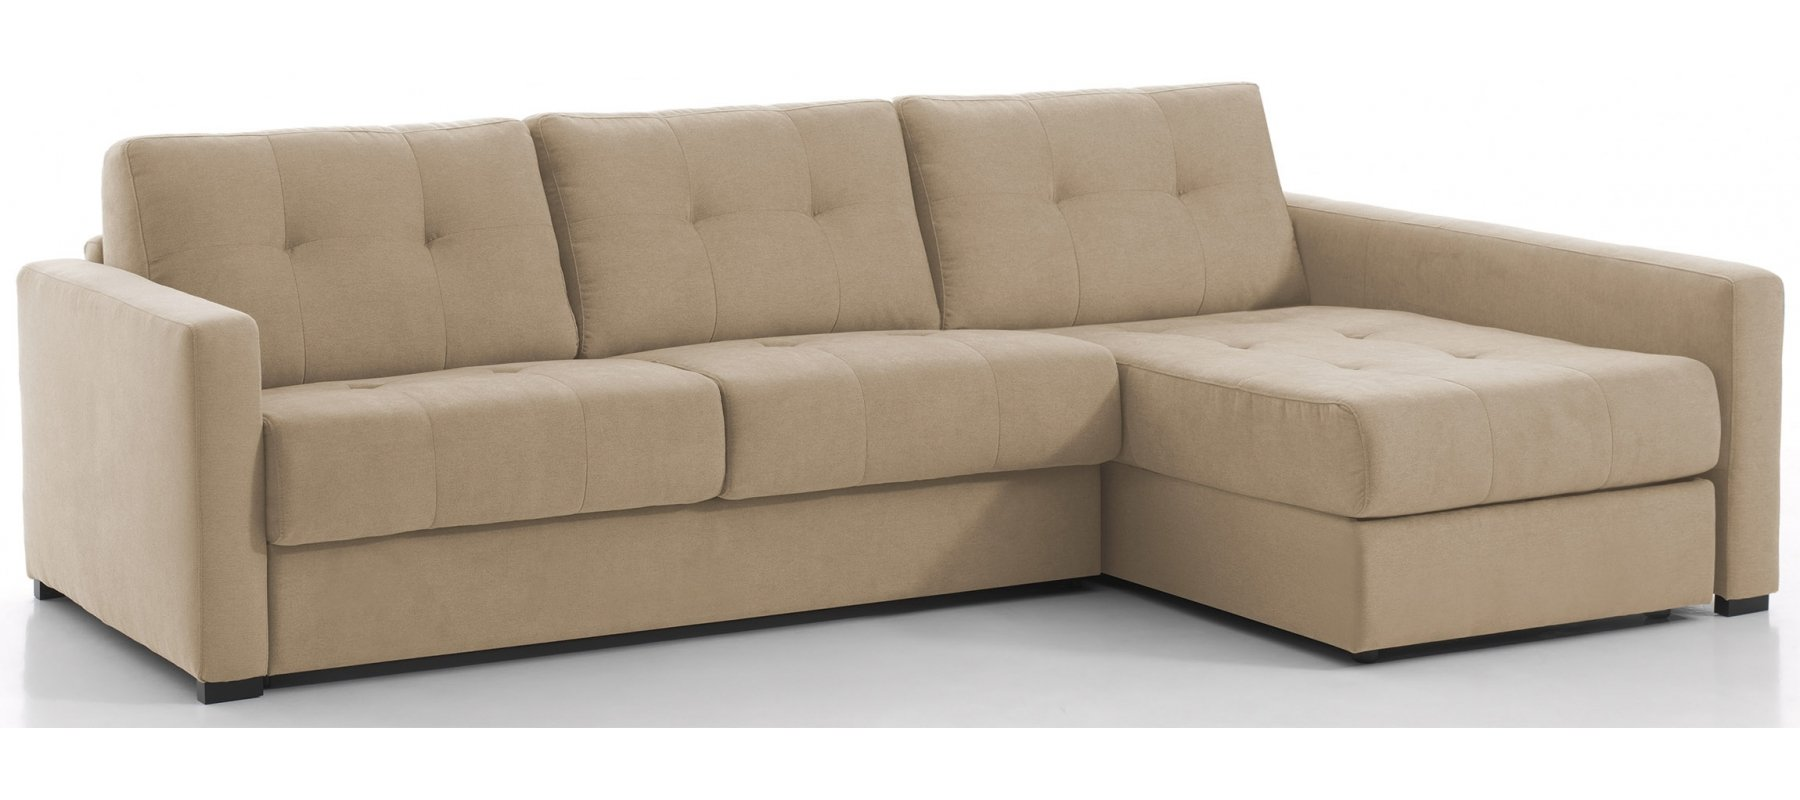 angle convertible rapido avec m ridienne r versible couchage 160cm. Black Bedroom Furniture Sets. Home Design Ideas